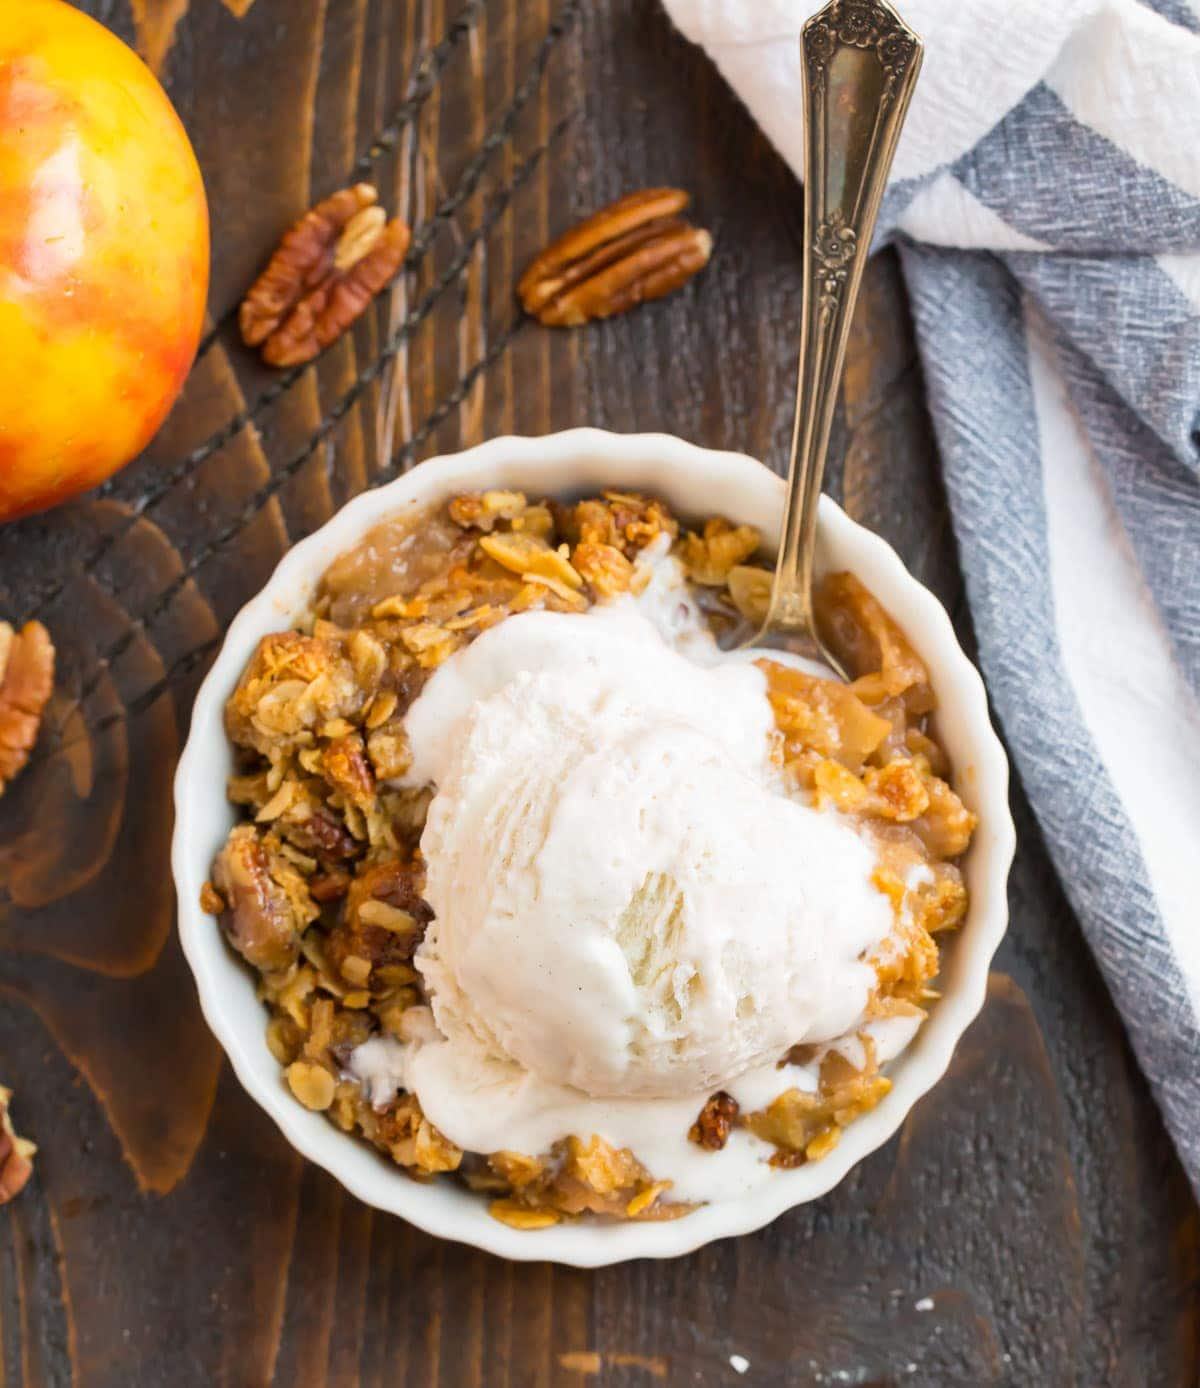 A bowl of gluten free apple crisp with vanilla ice cream